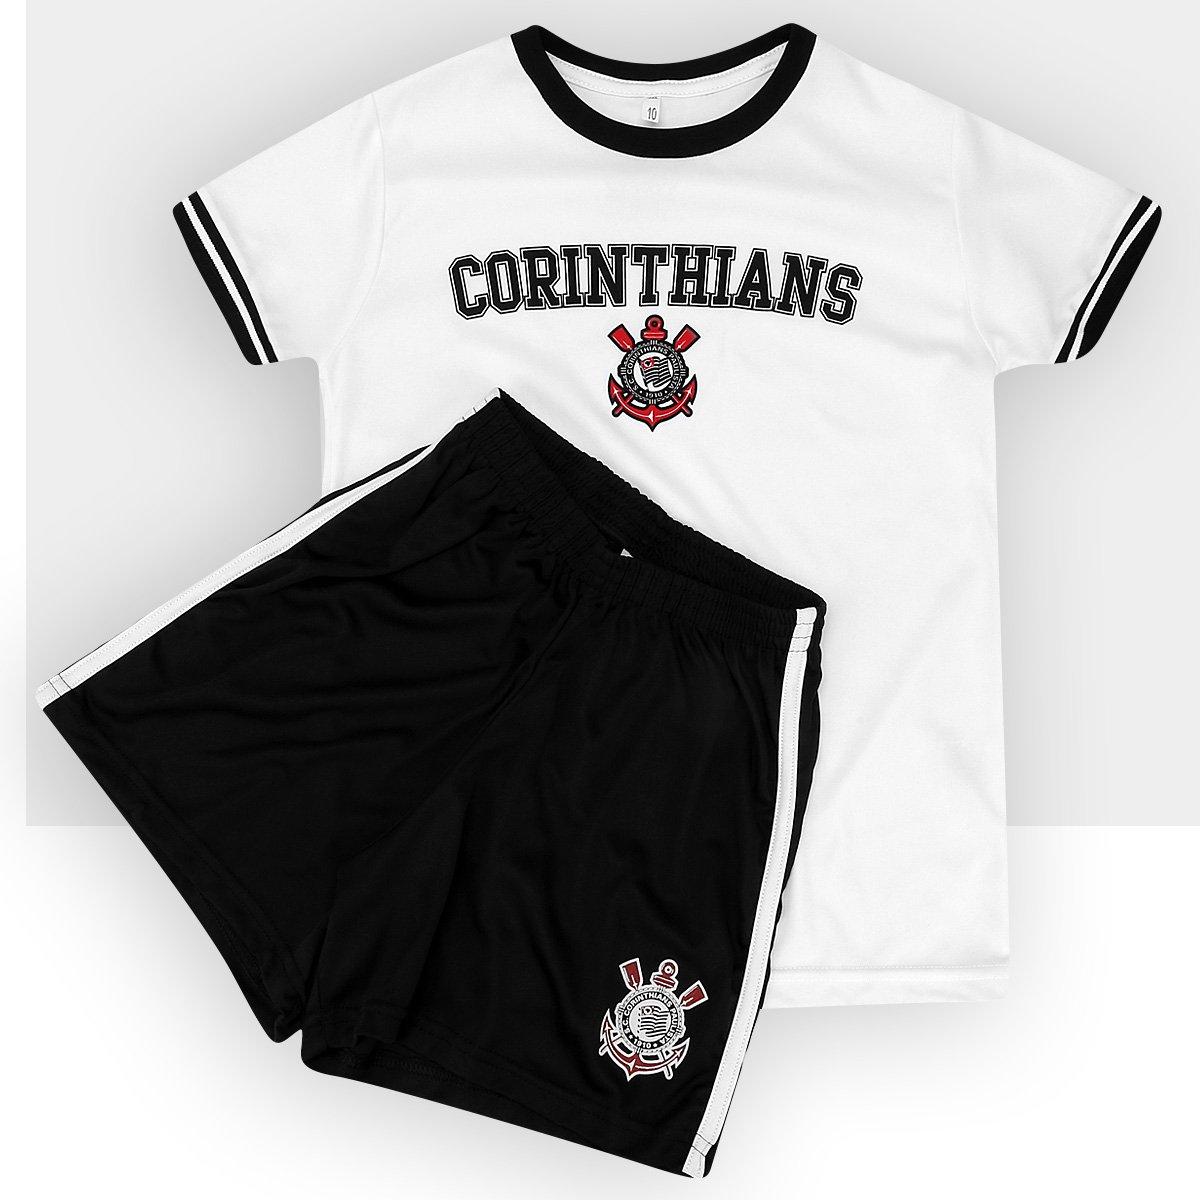 289f990d855c6 Kit Corinthians Juvenil - Compre Agora